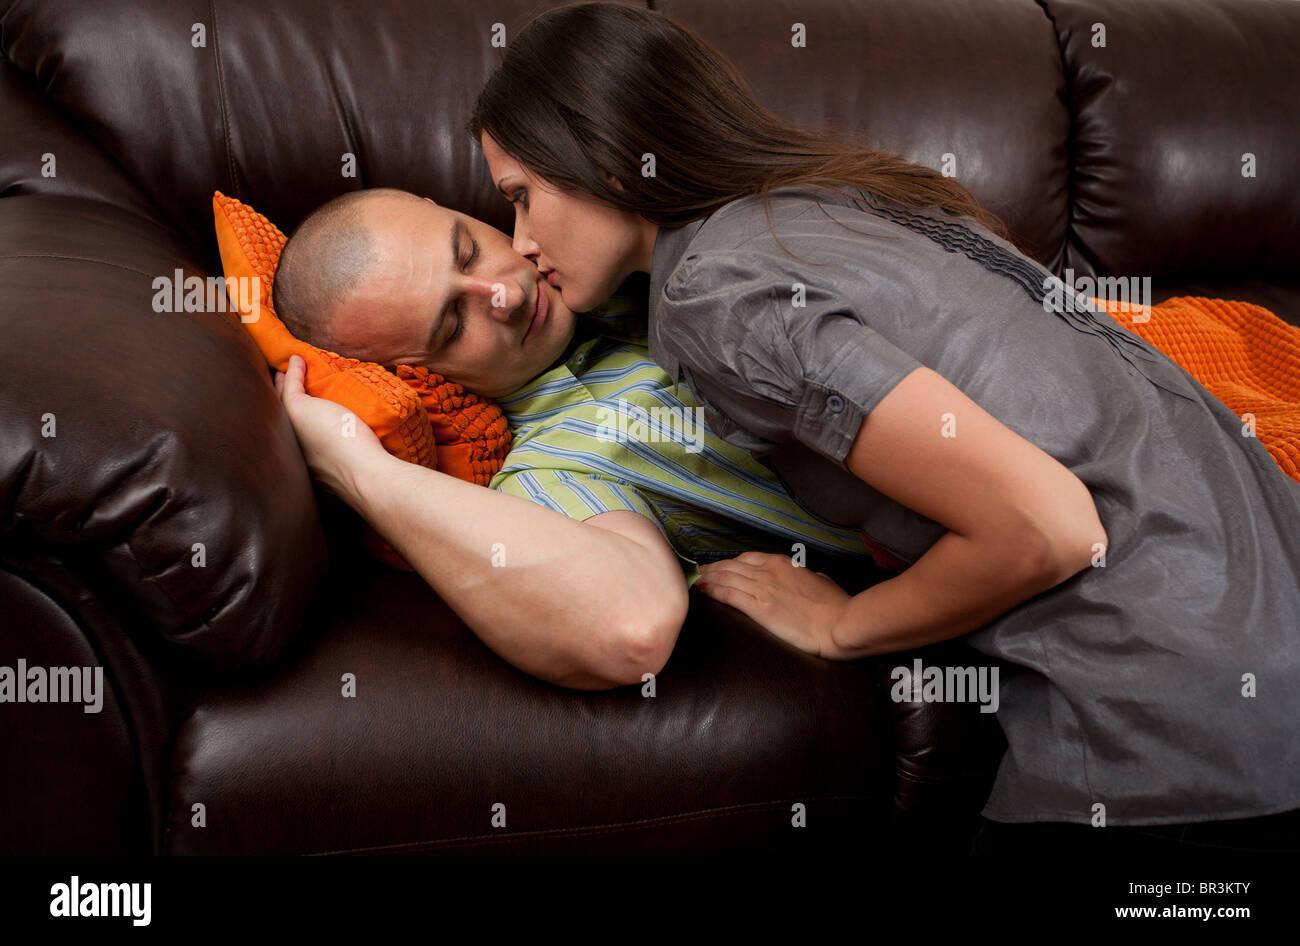 Wife sleeping on sofa remarkable, very